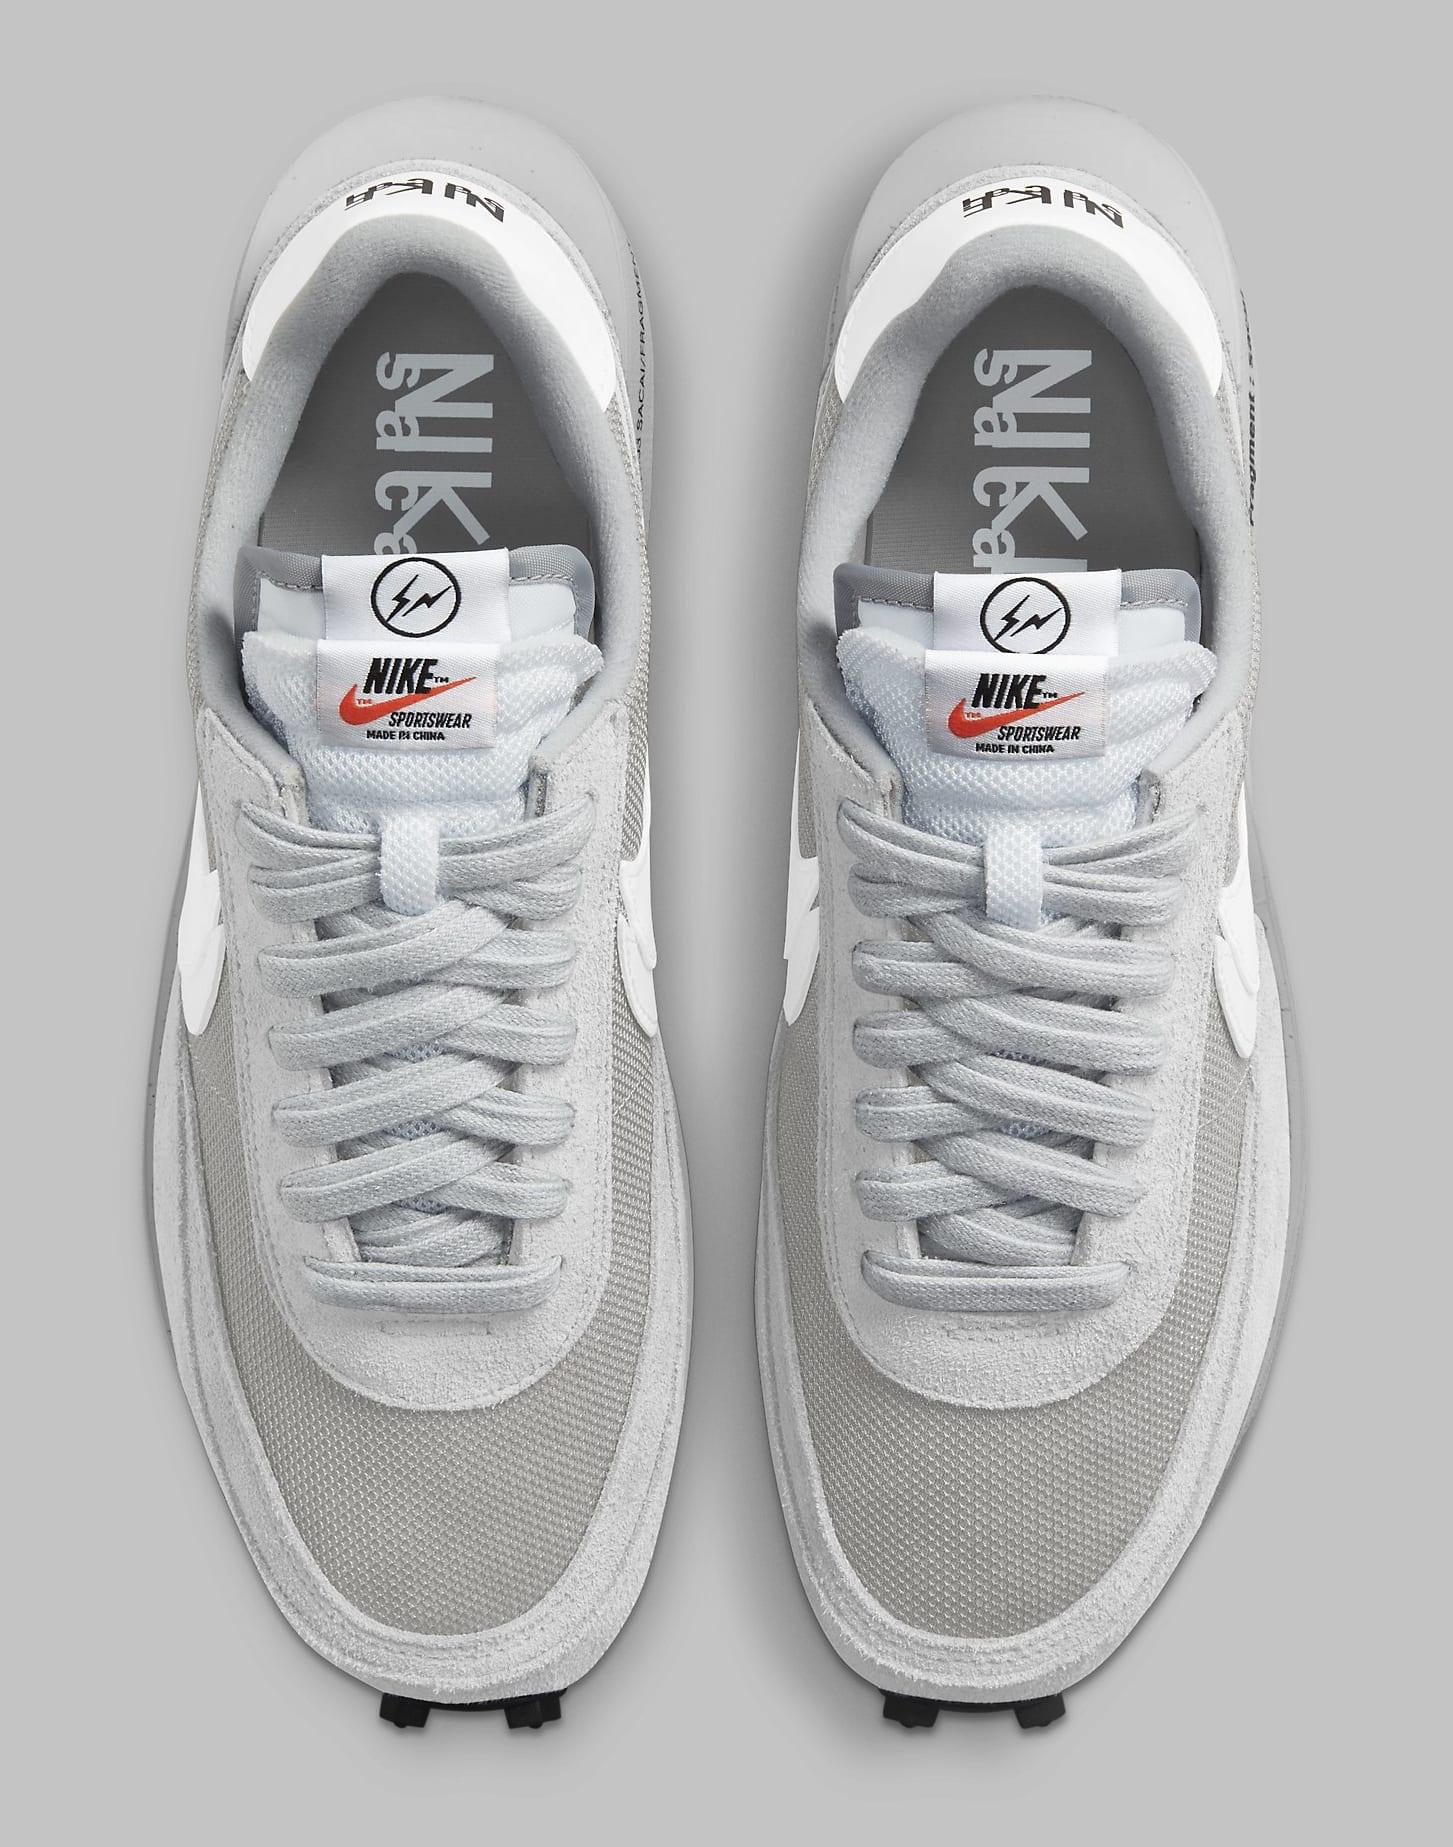 Fragment x Sacai x Nike LDWaffle 'Light Smoke Grey' DH2684-001 Top